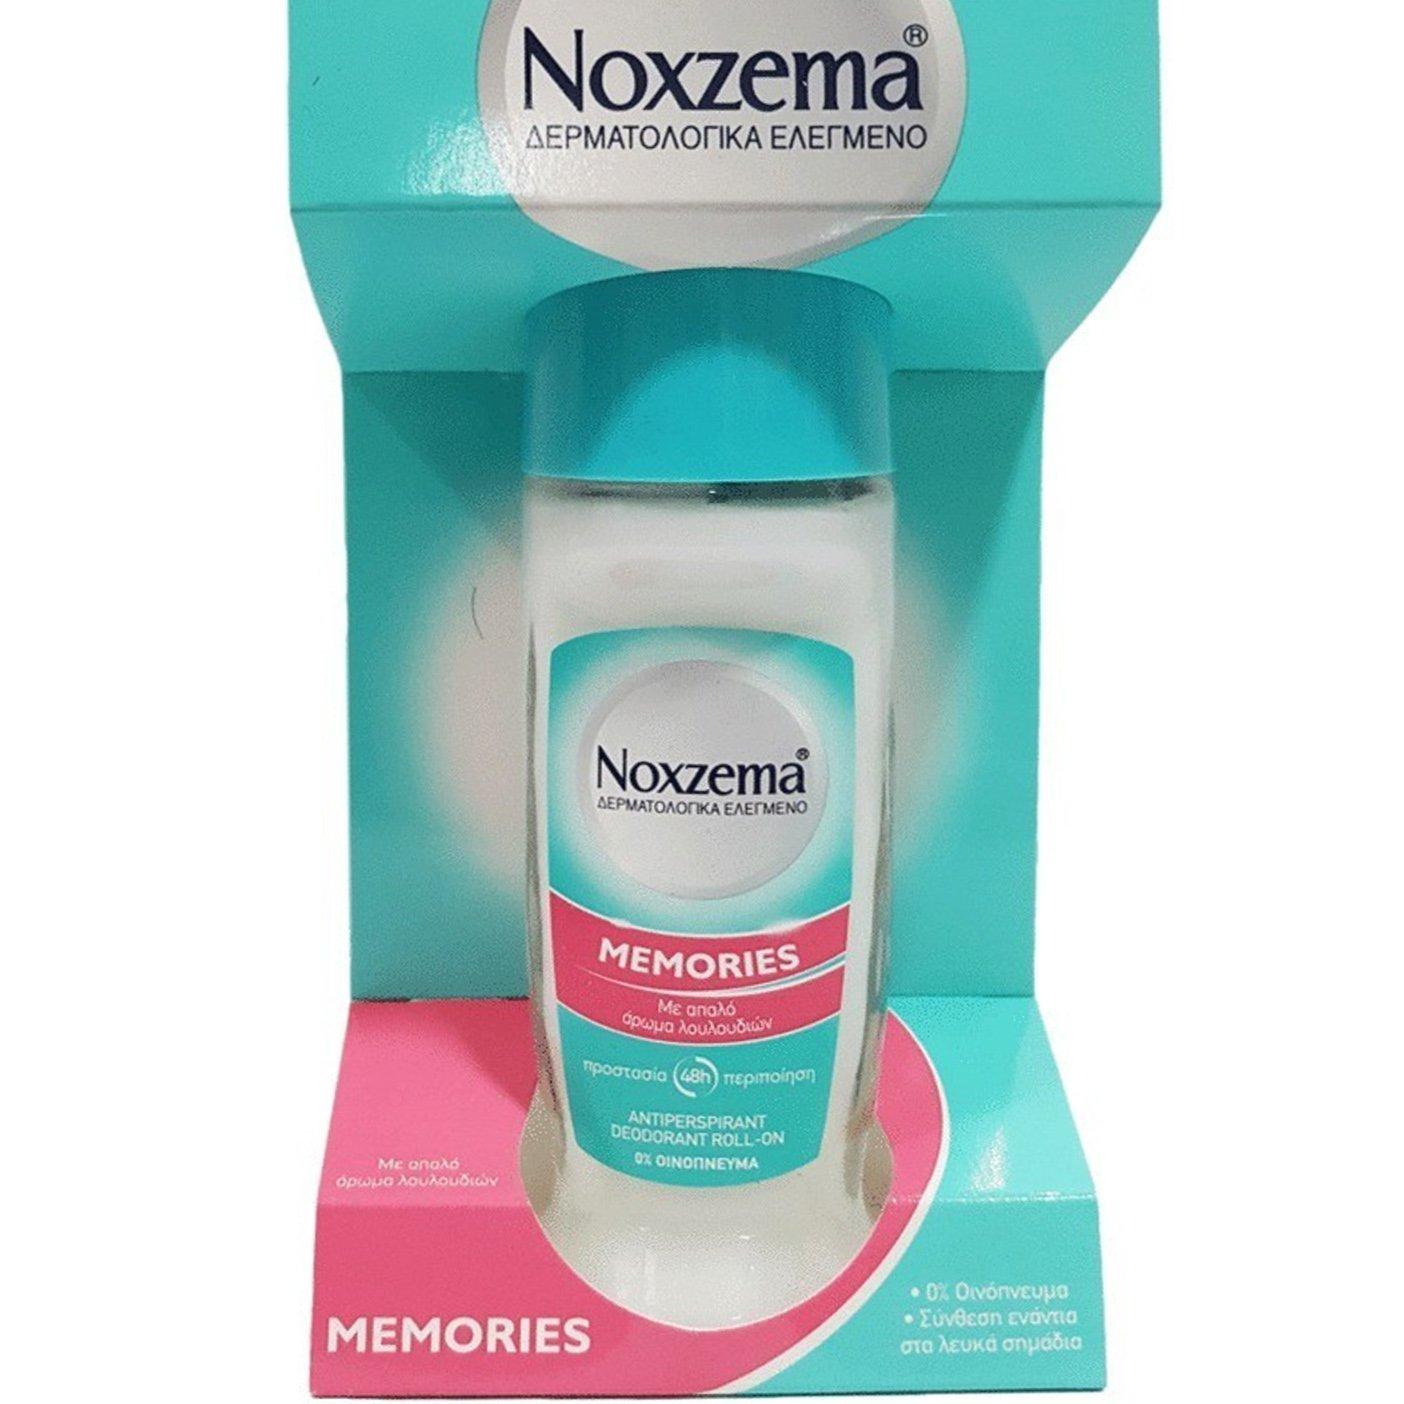 Noxzema Roll On Memories Ευχάριστη Αίσθηση Φρεσκάδας 50ml